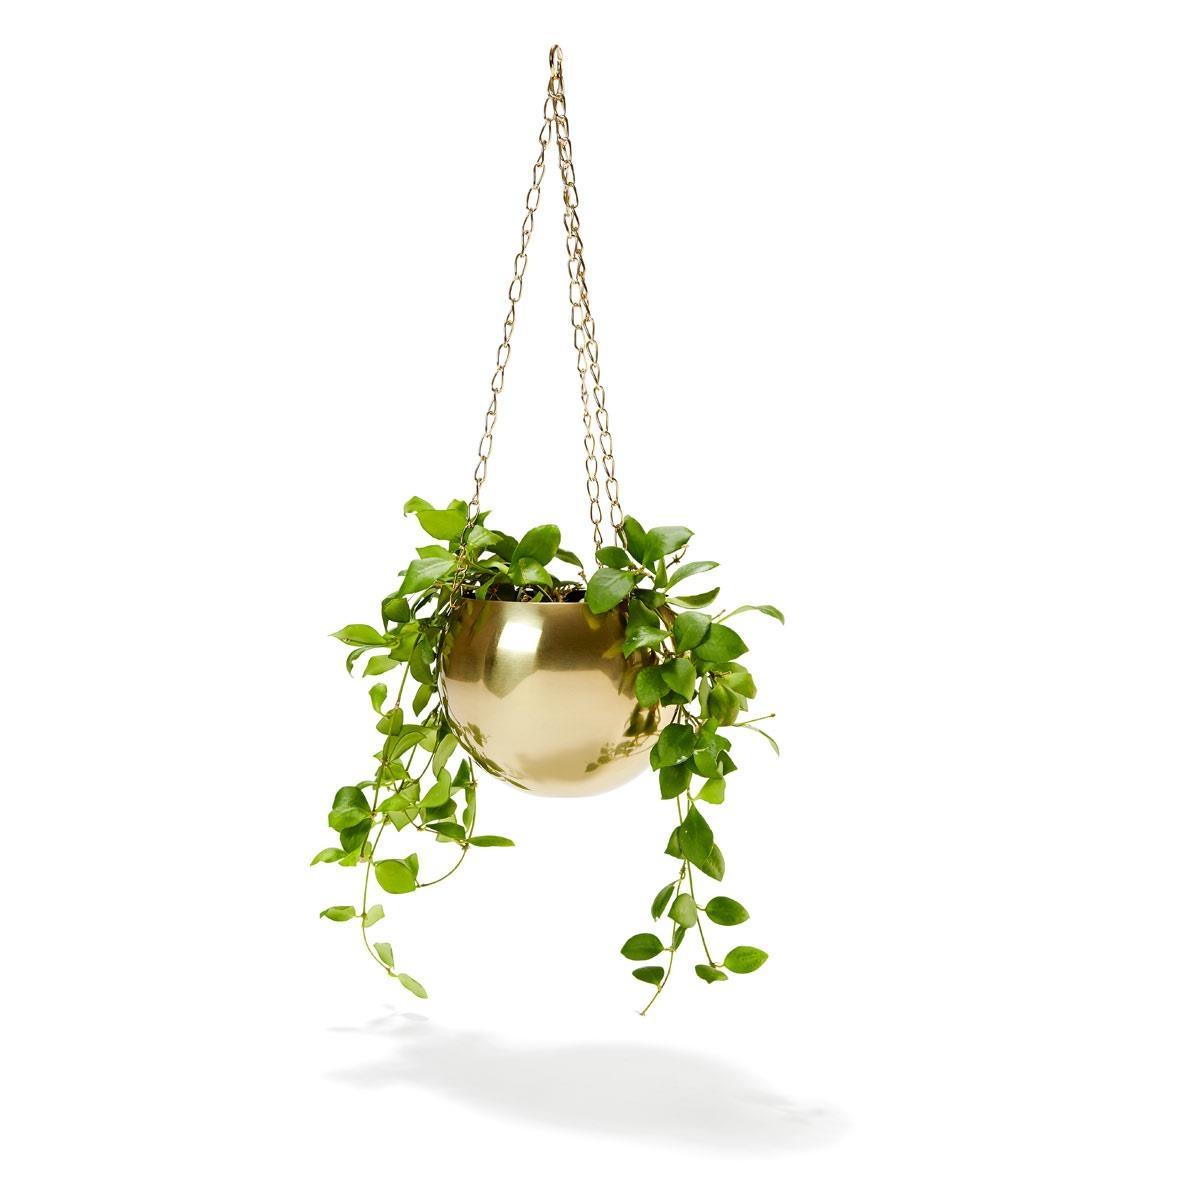 Brass Plated Hanging Planter Kmart